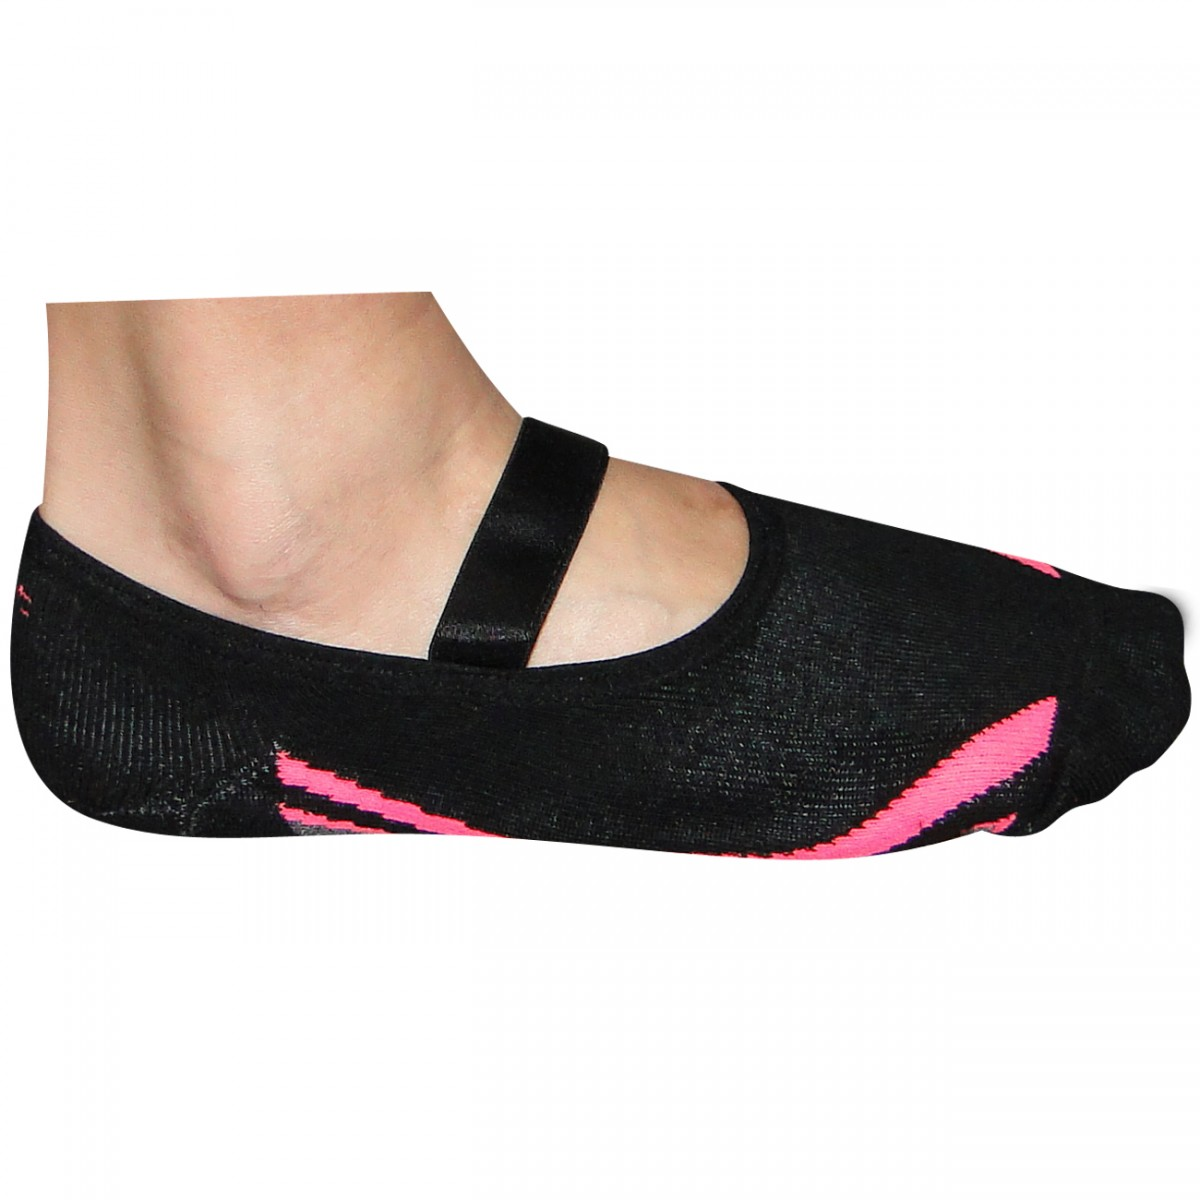 49299a429 Meia Puket Pilates CB8529 10601258-199 - Preto Pink - Chuteira Nike ...